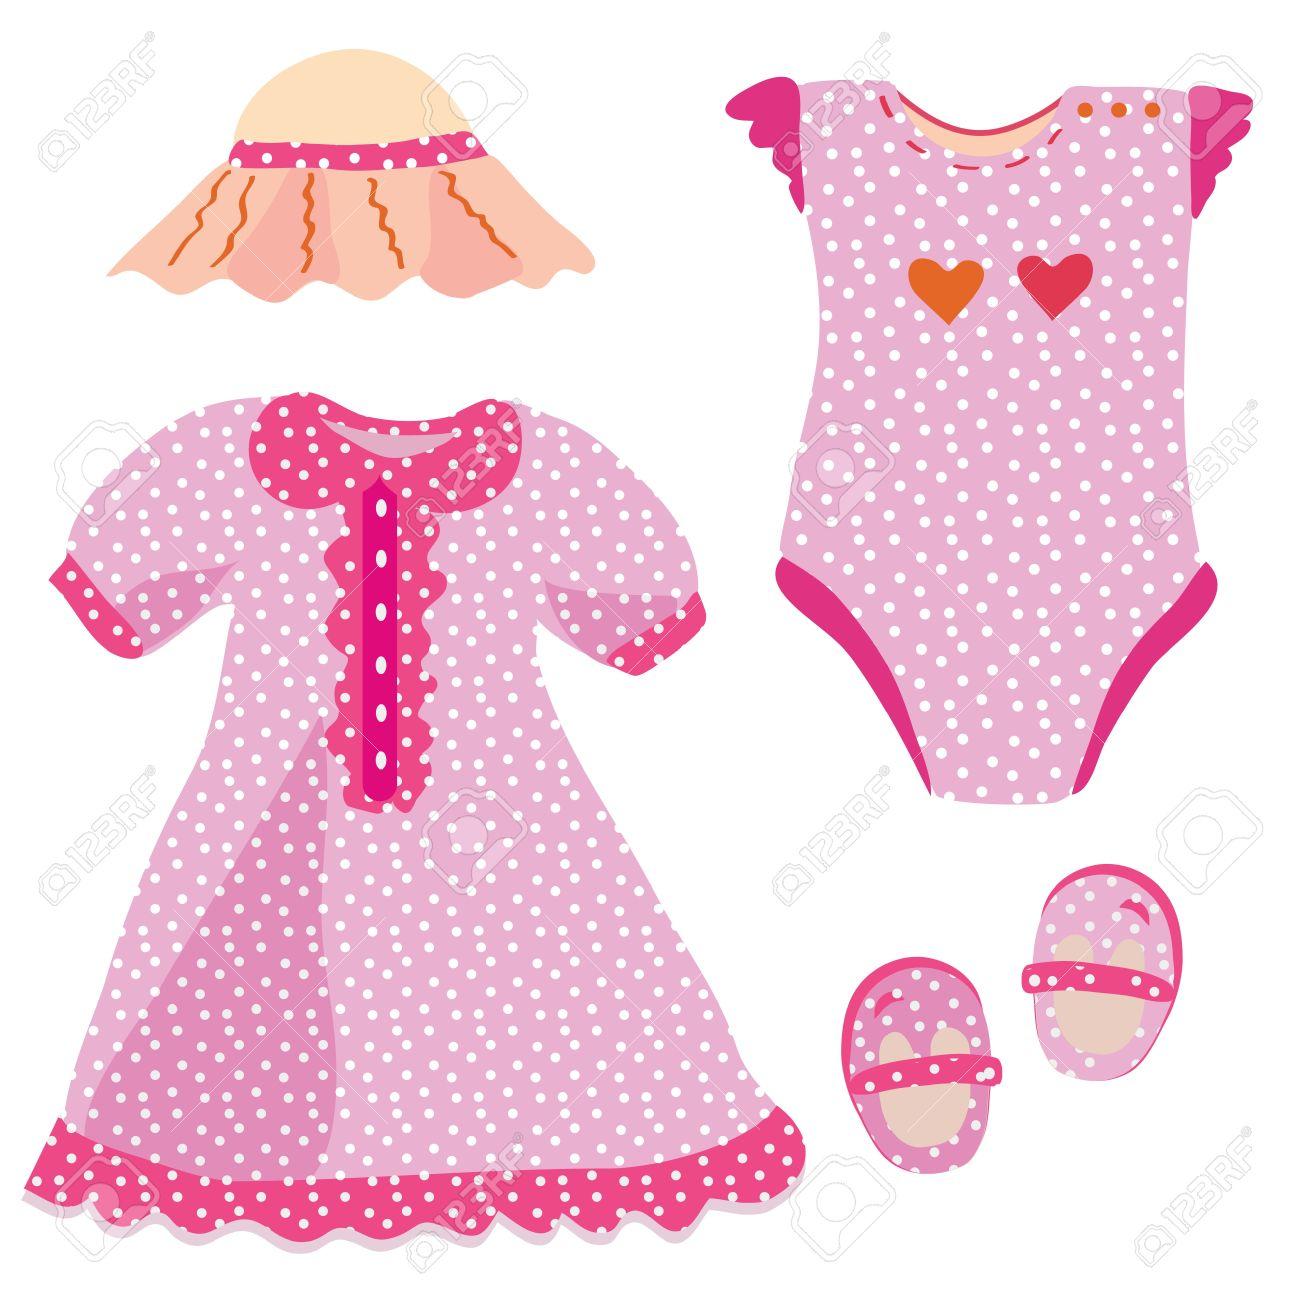 Baby set for girl - dress, hat, babygro, shoes Stock Vector - 9502629